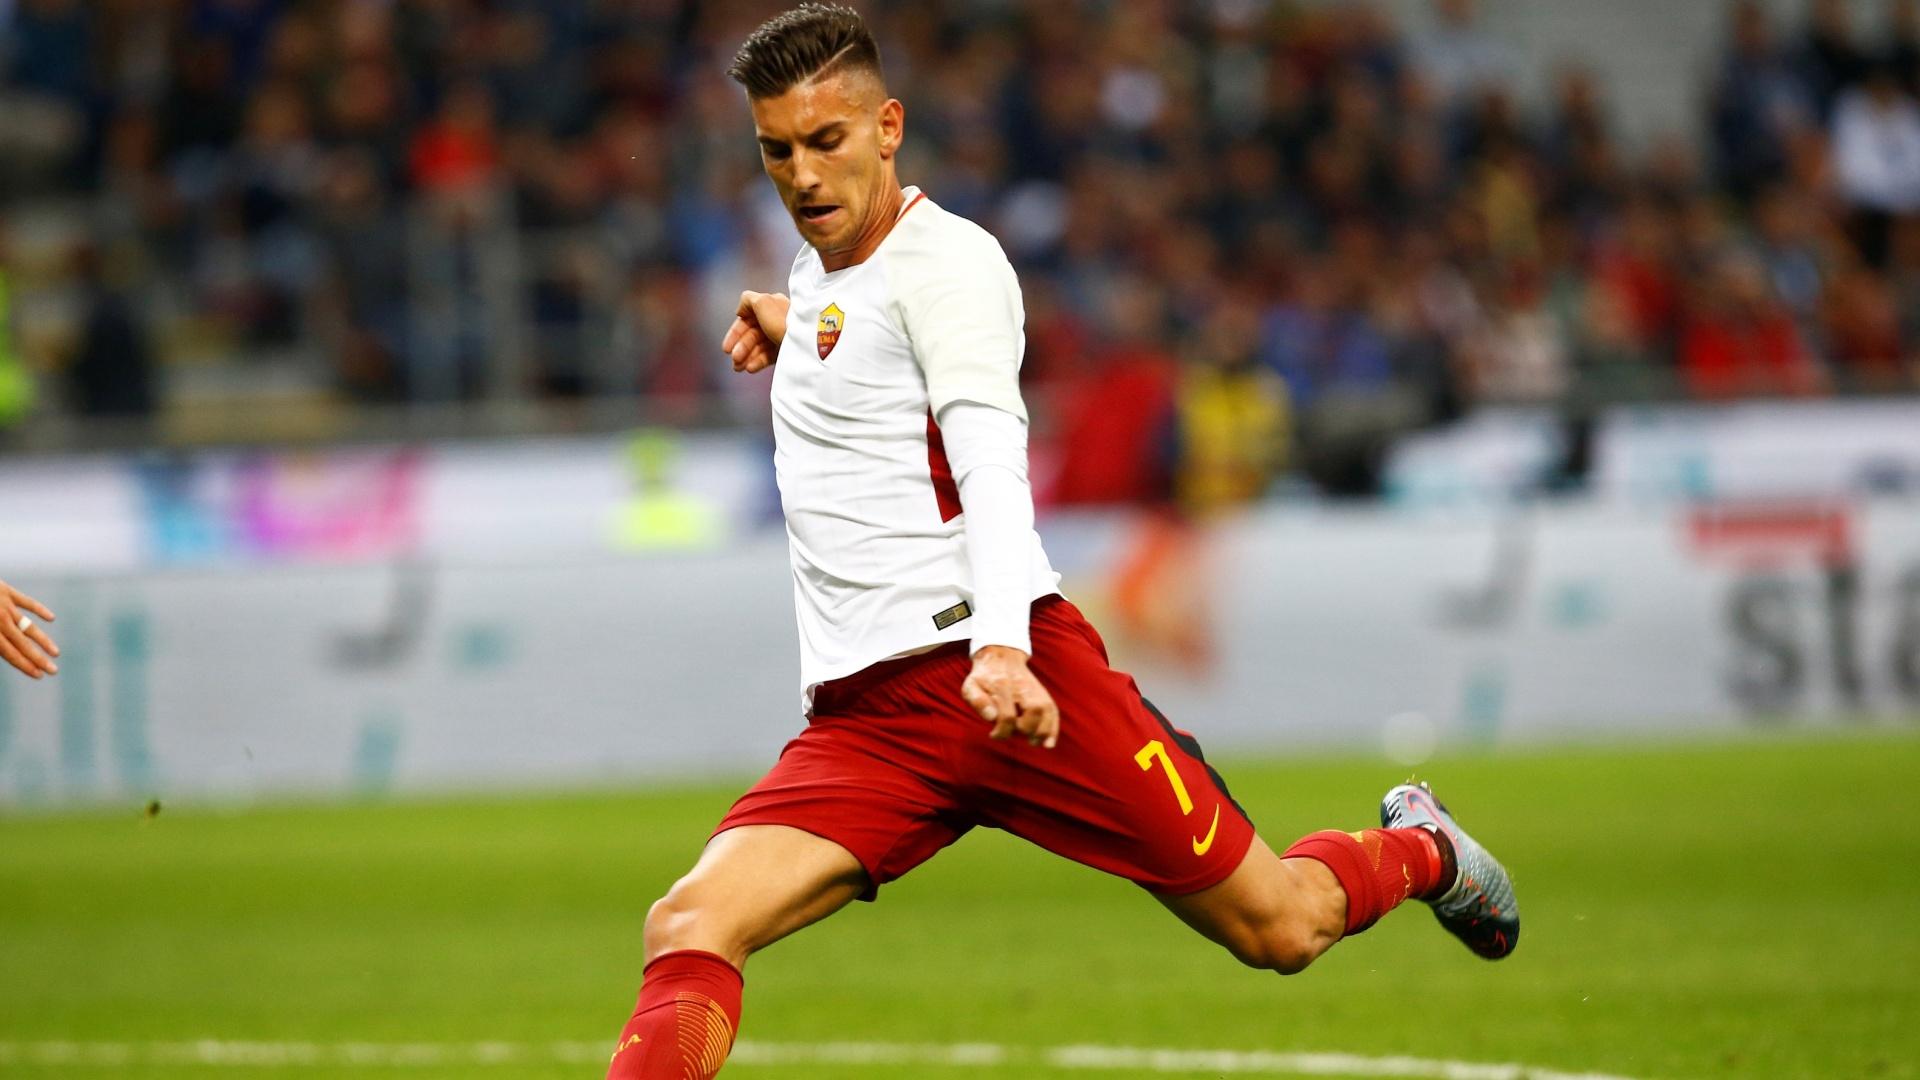 Lorenzo Pellegrini está na mira de United e City